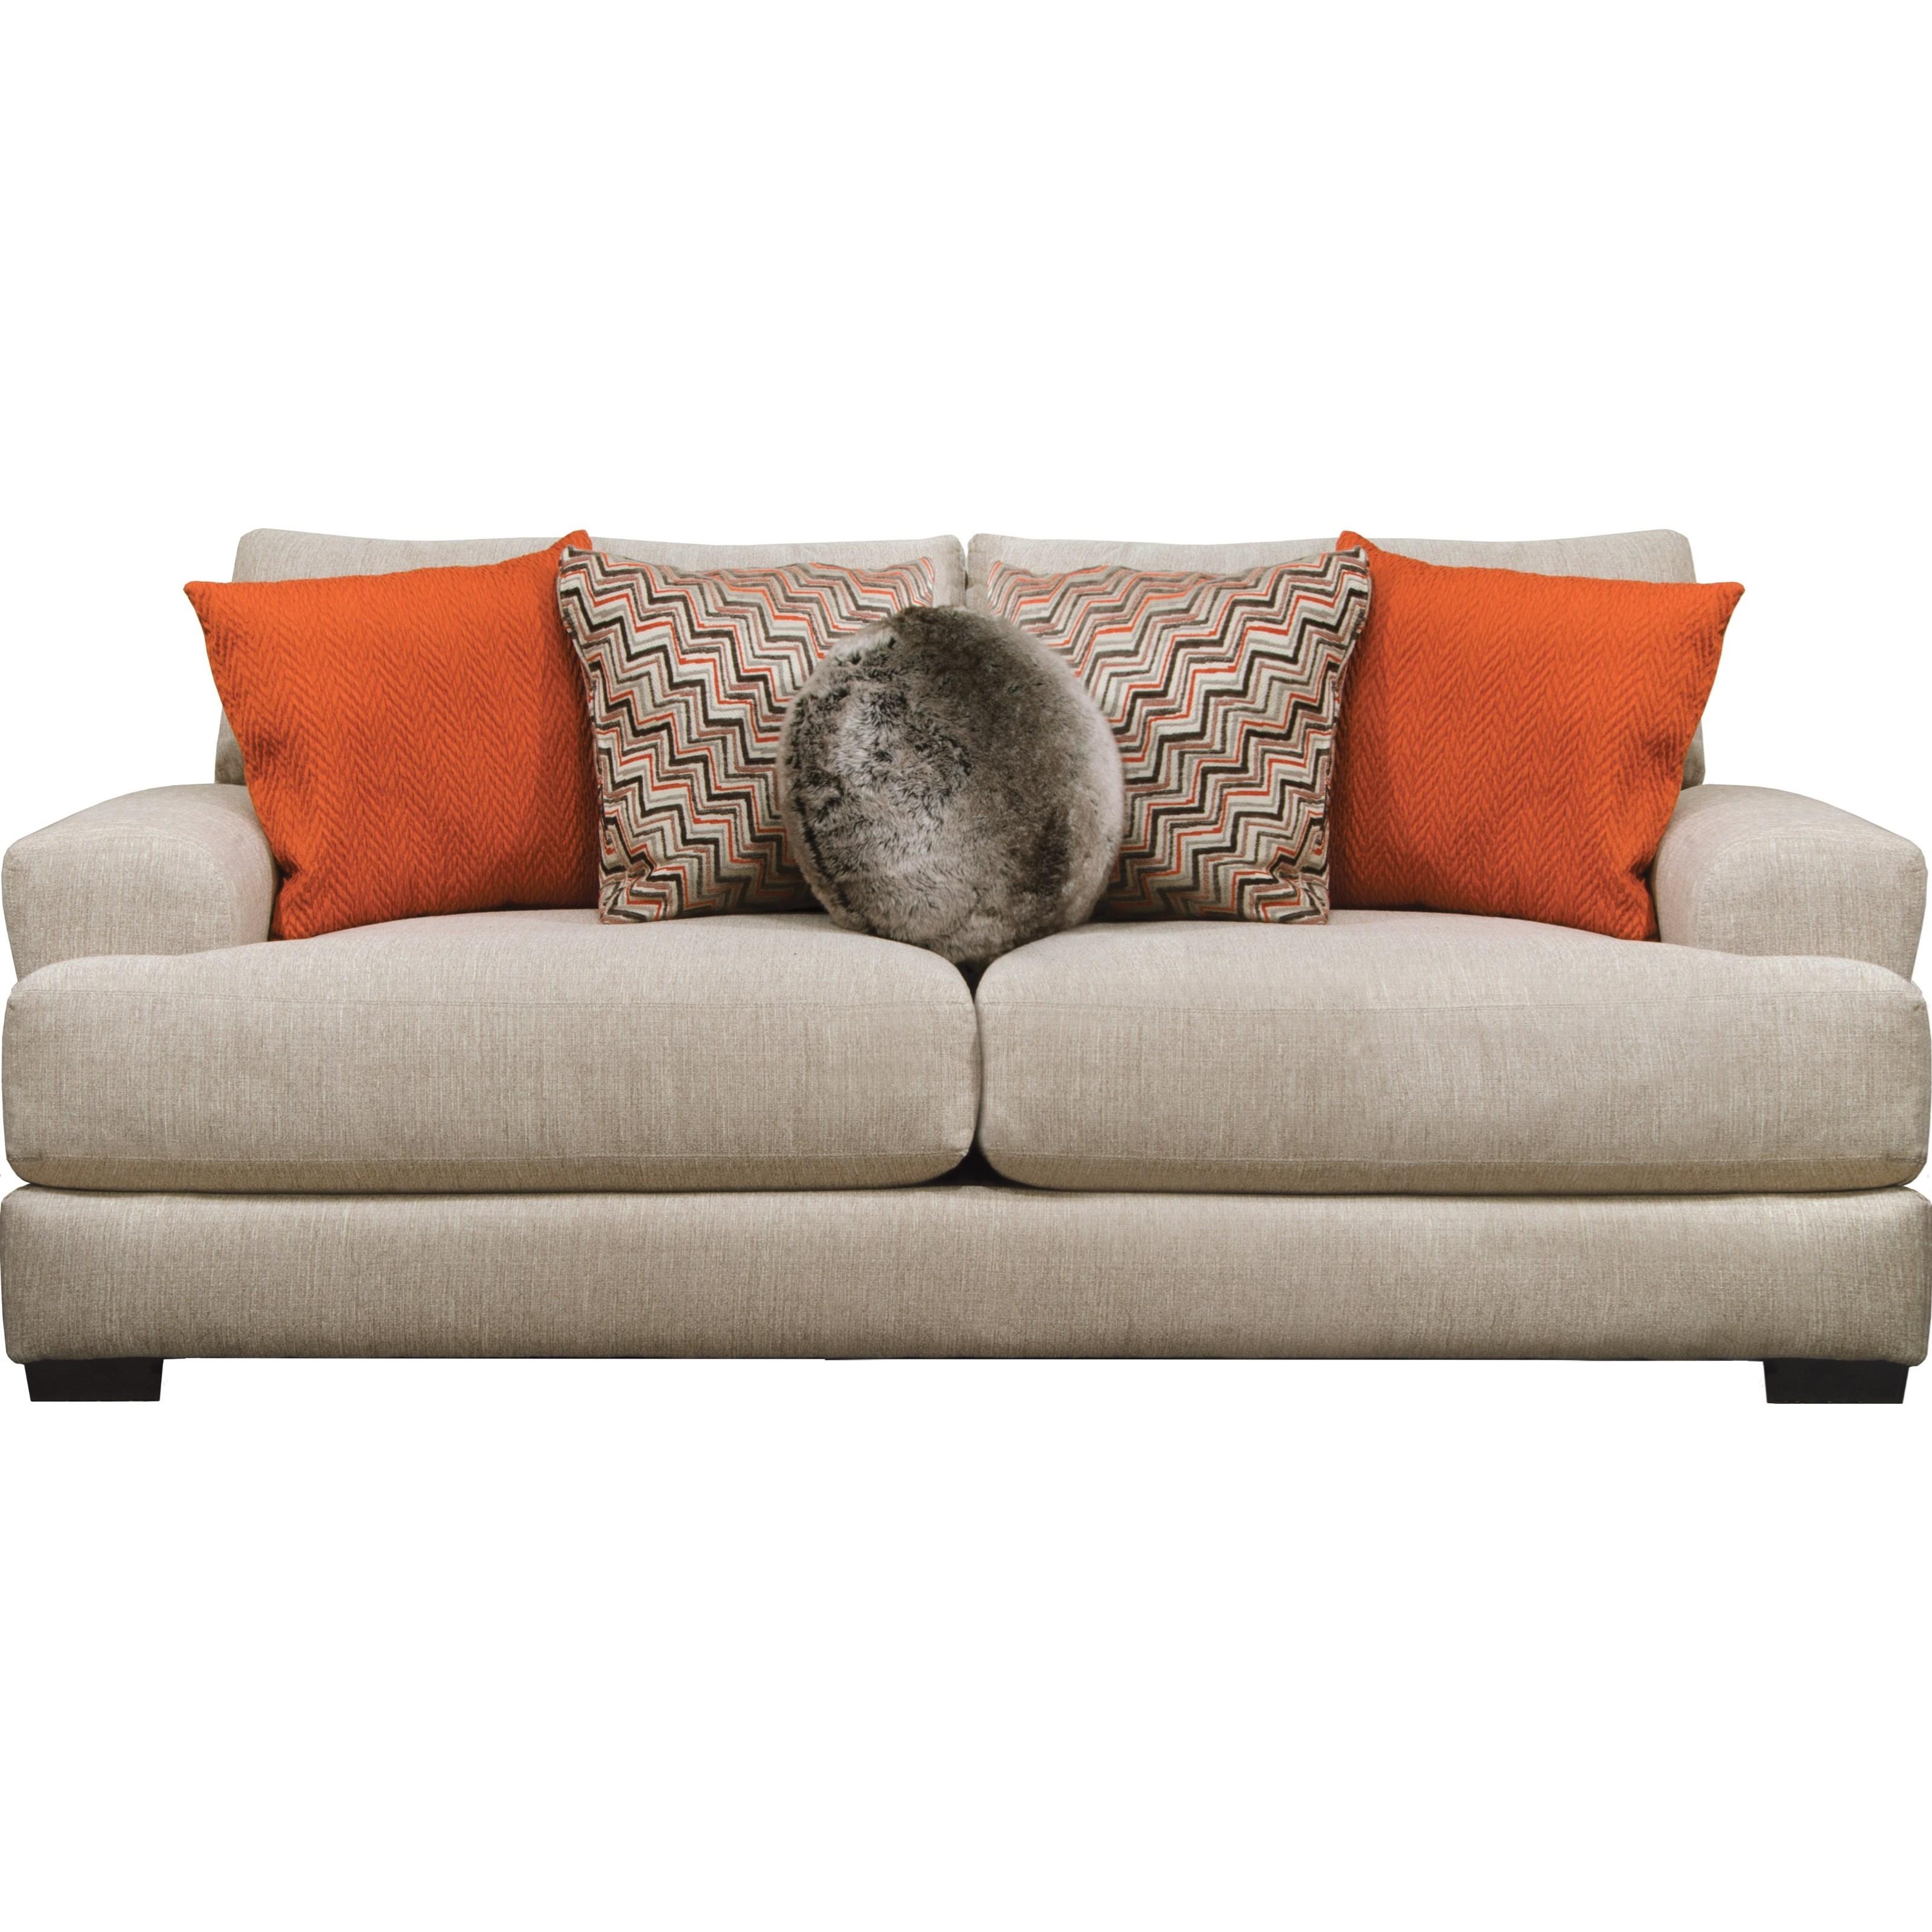 Ava Sofa w/ USB Port by Jackson Furniture at Lapeer Furniture & Mattress Center